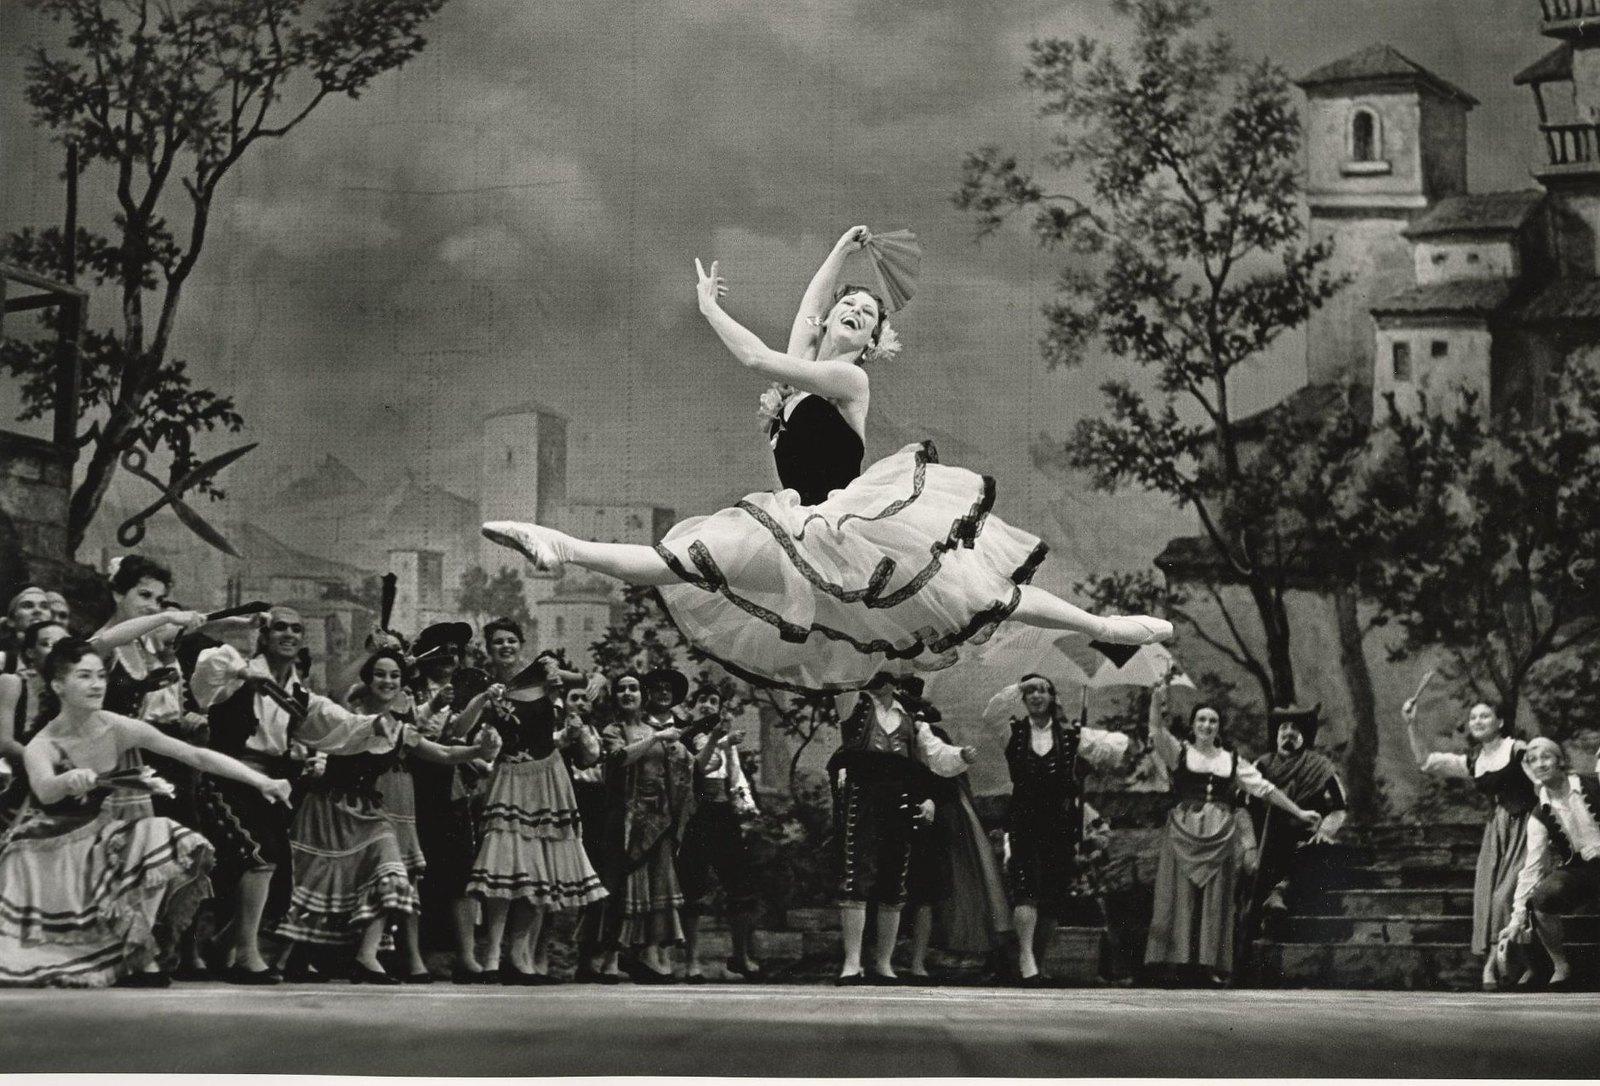 1964. Майя Плисецкая в партии Китри в балете Большого театра «Дон-Кихот»